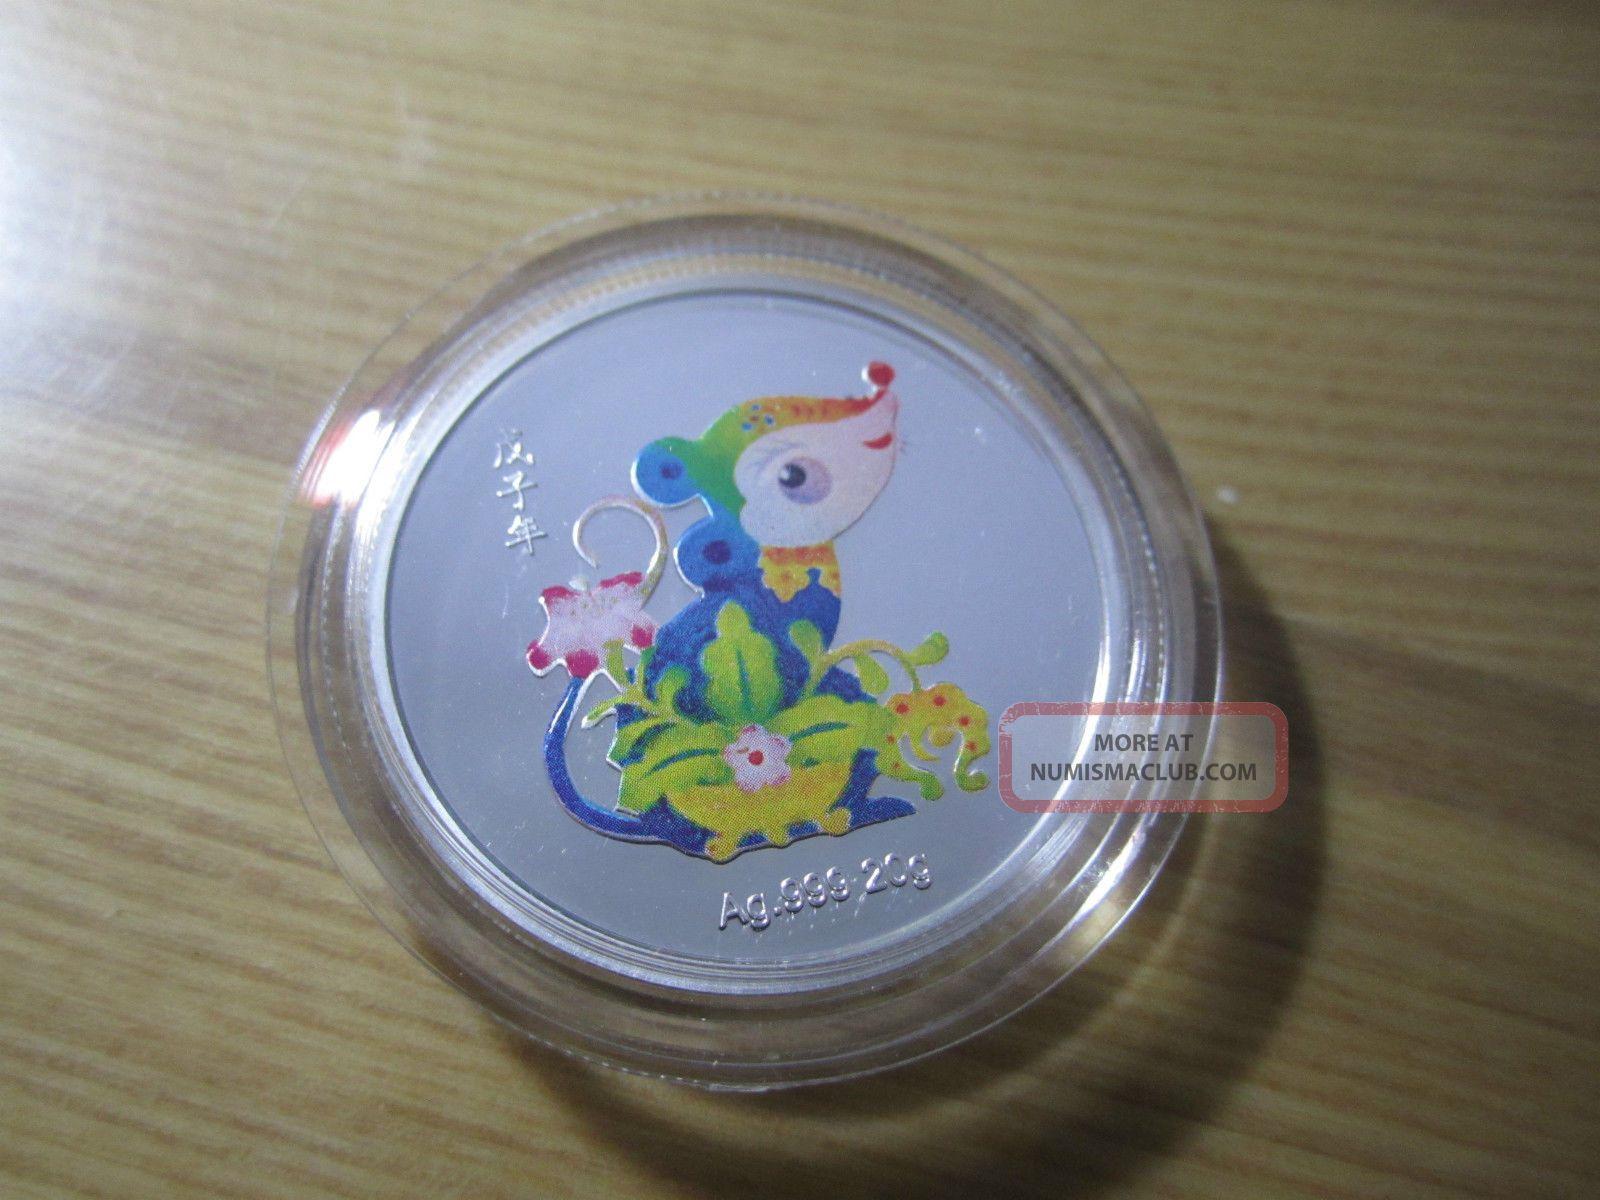 China 2008 20g Colorized Silver Medal - Year Of Rat Exonumia photo